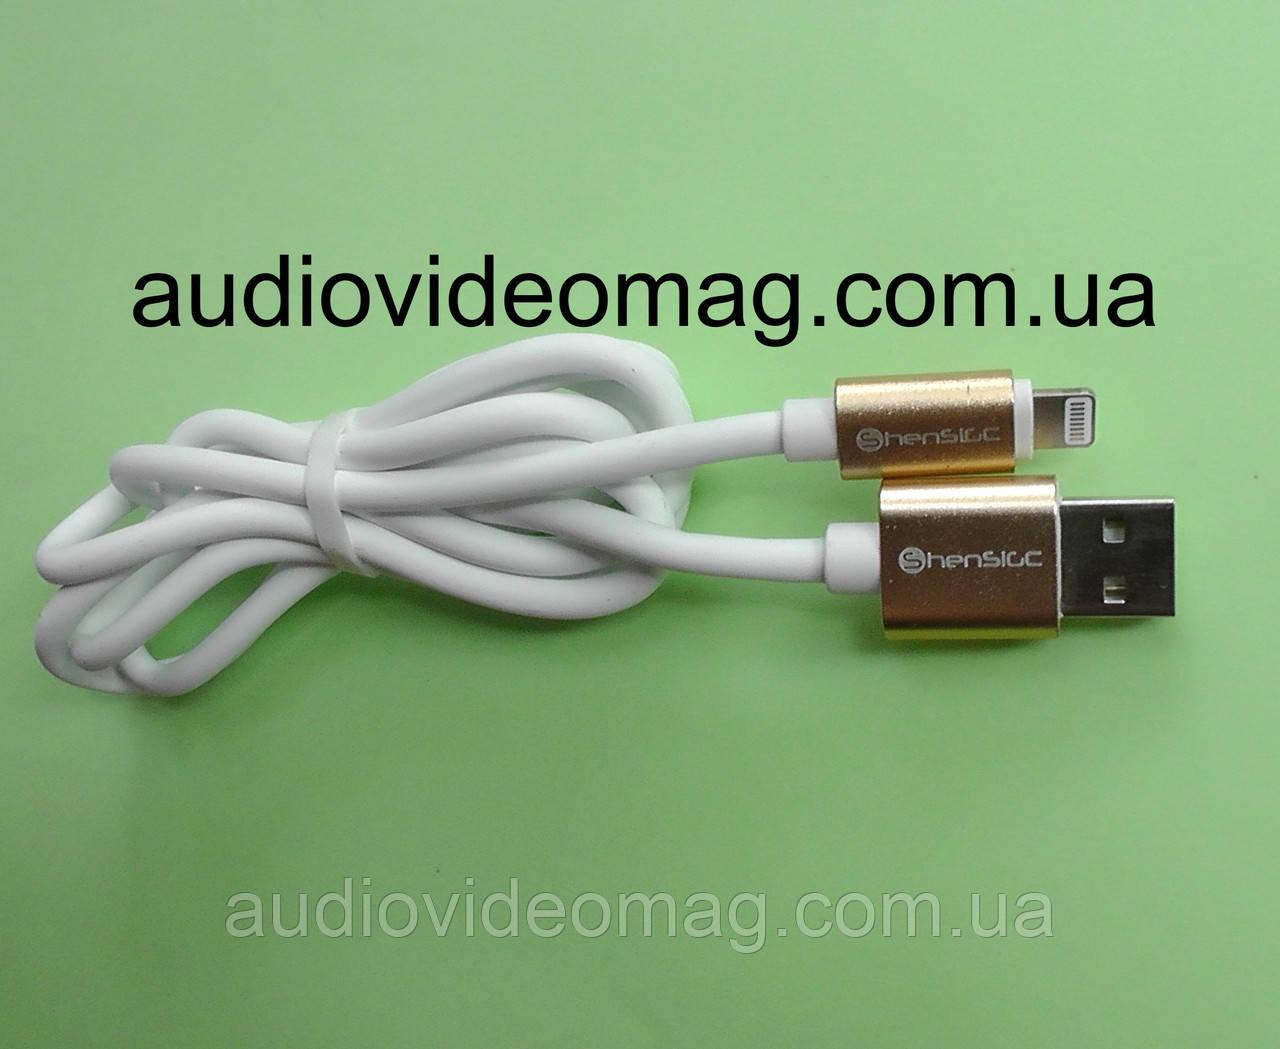 Кабель USB Lightning для Apple iPhone для швидкої зарядки, 5А, довжина 1,2 м